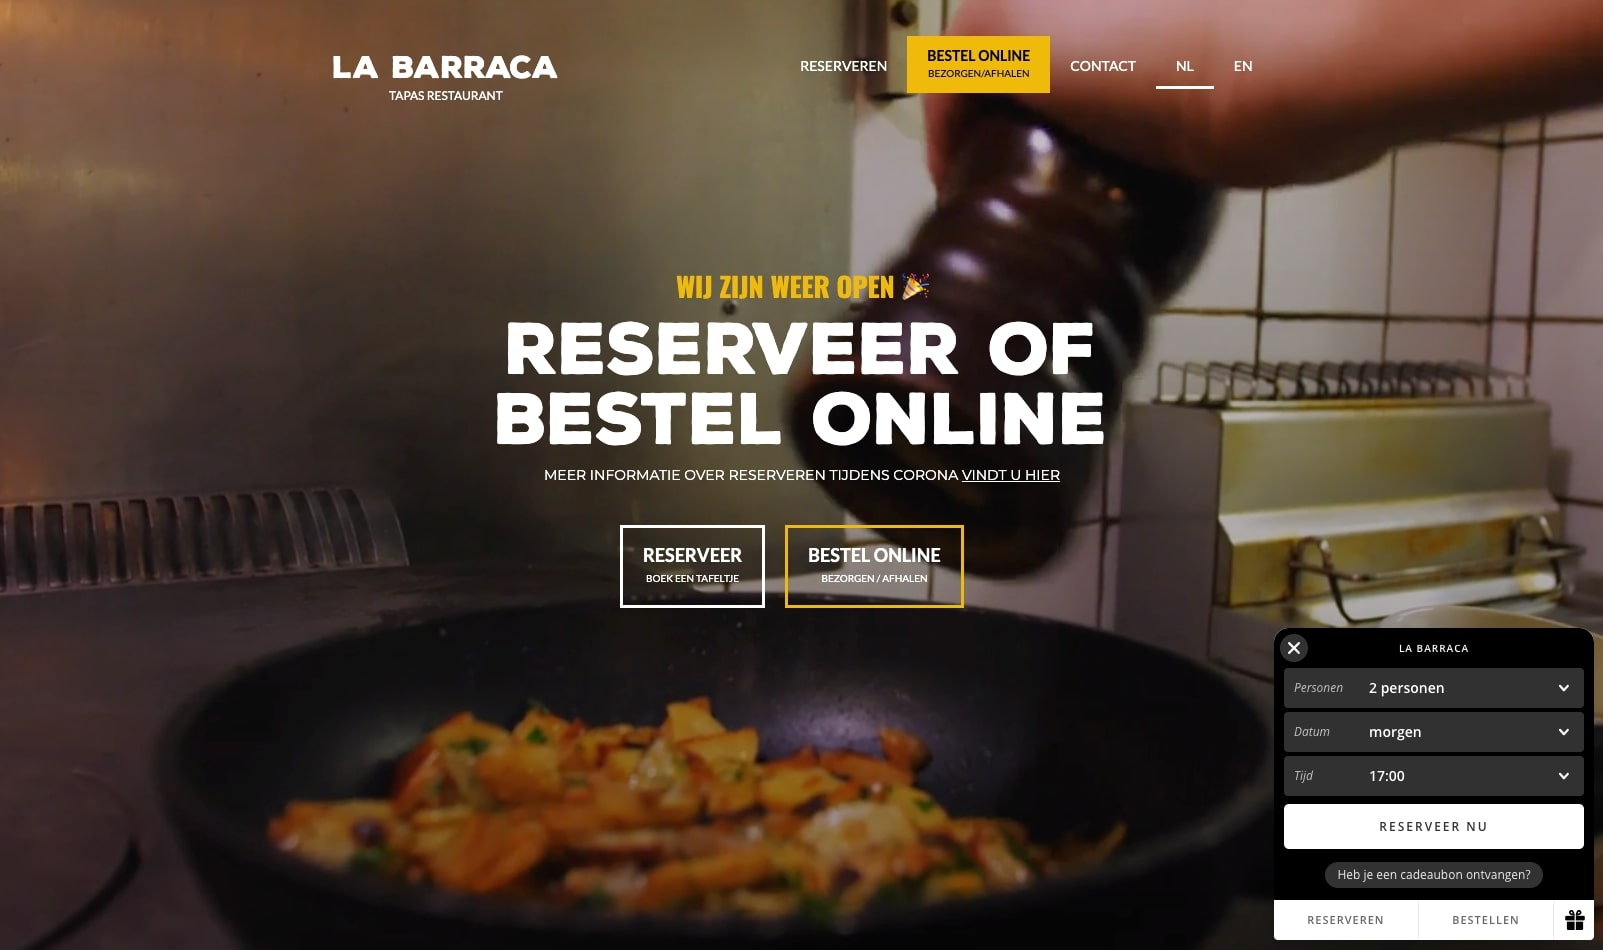 La Barraca restaurant homepage